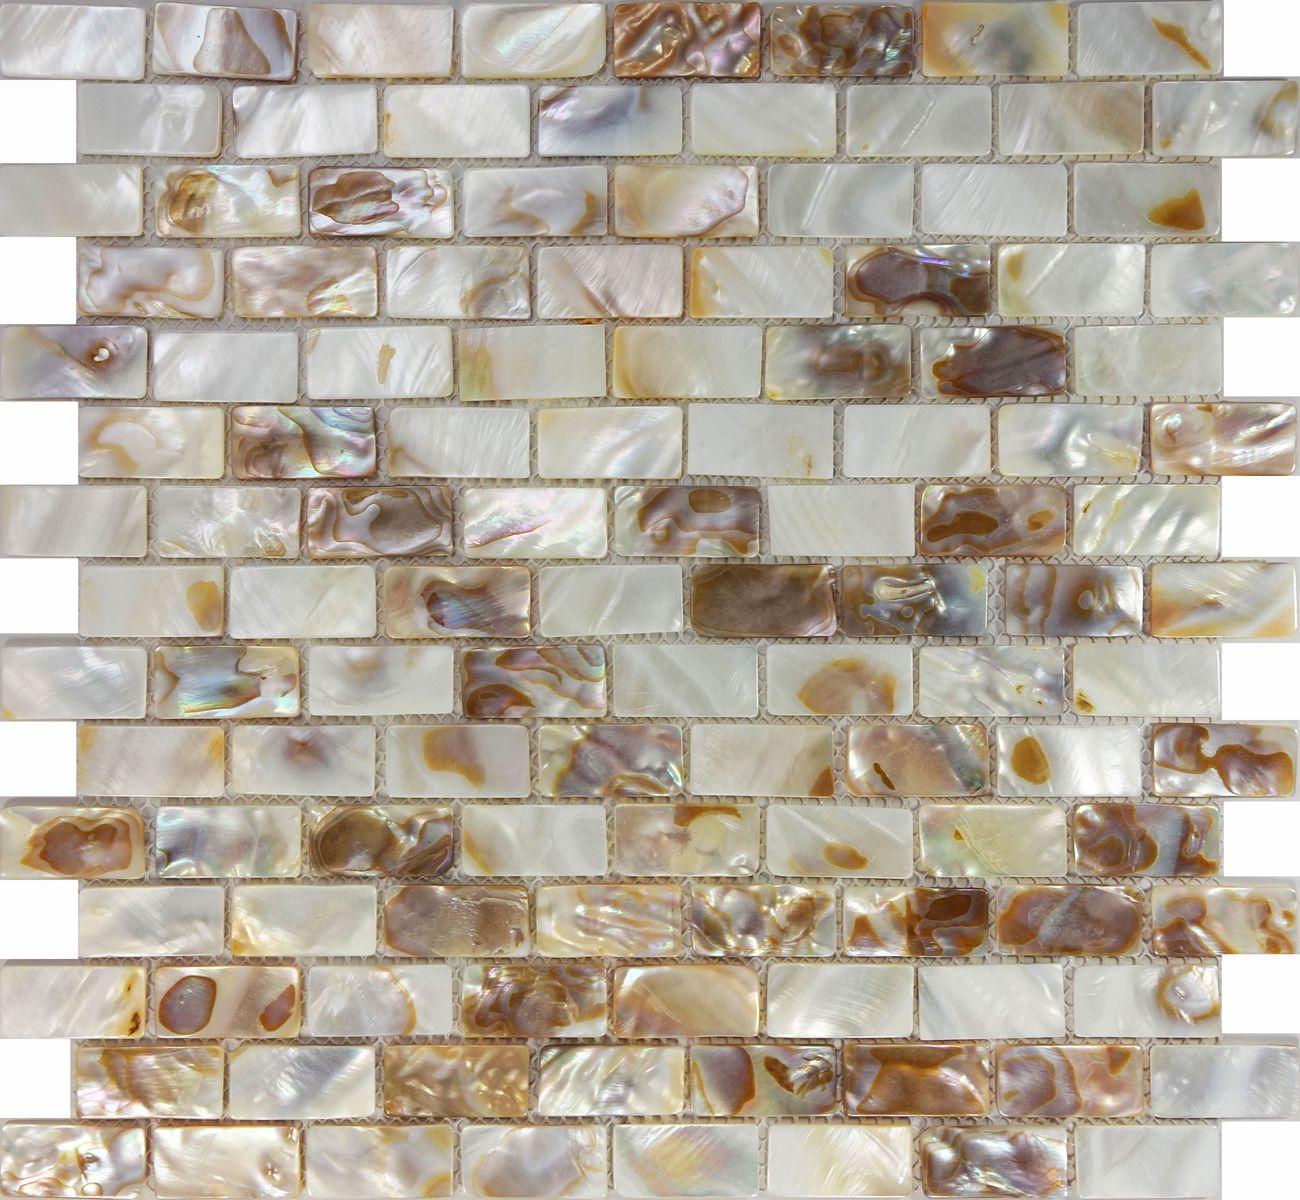 Küchenideen ziegel sample mother of pearl sea shell subway brick mosaic tile kitchen